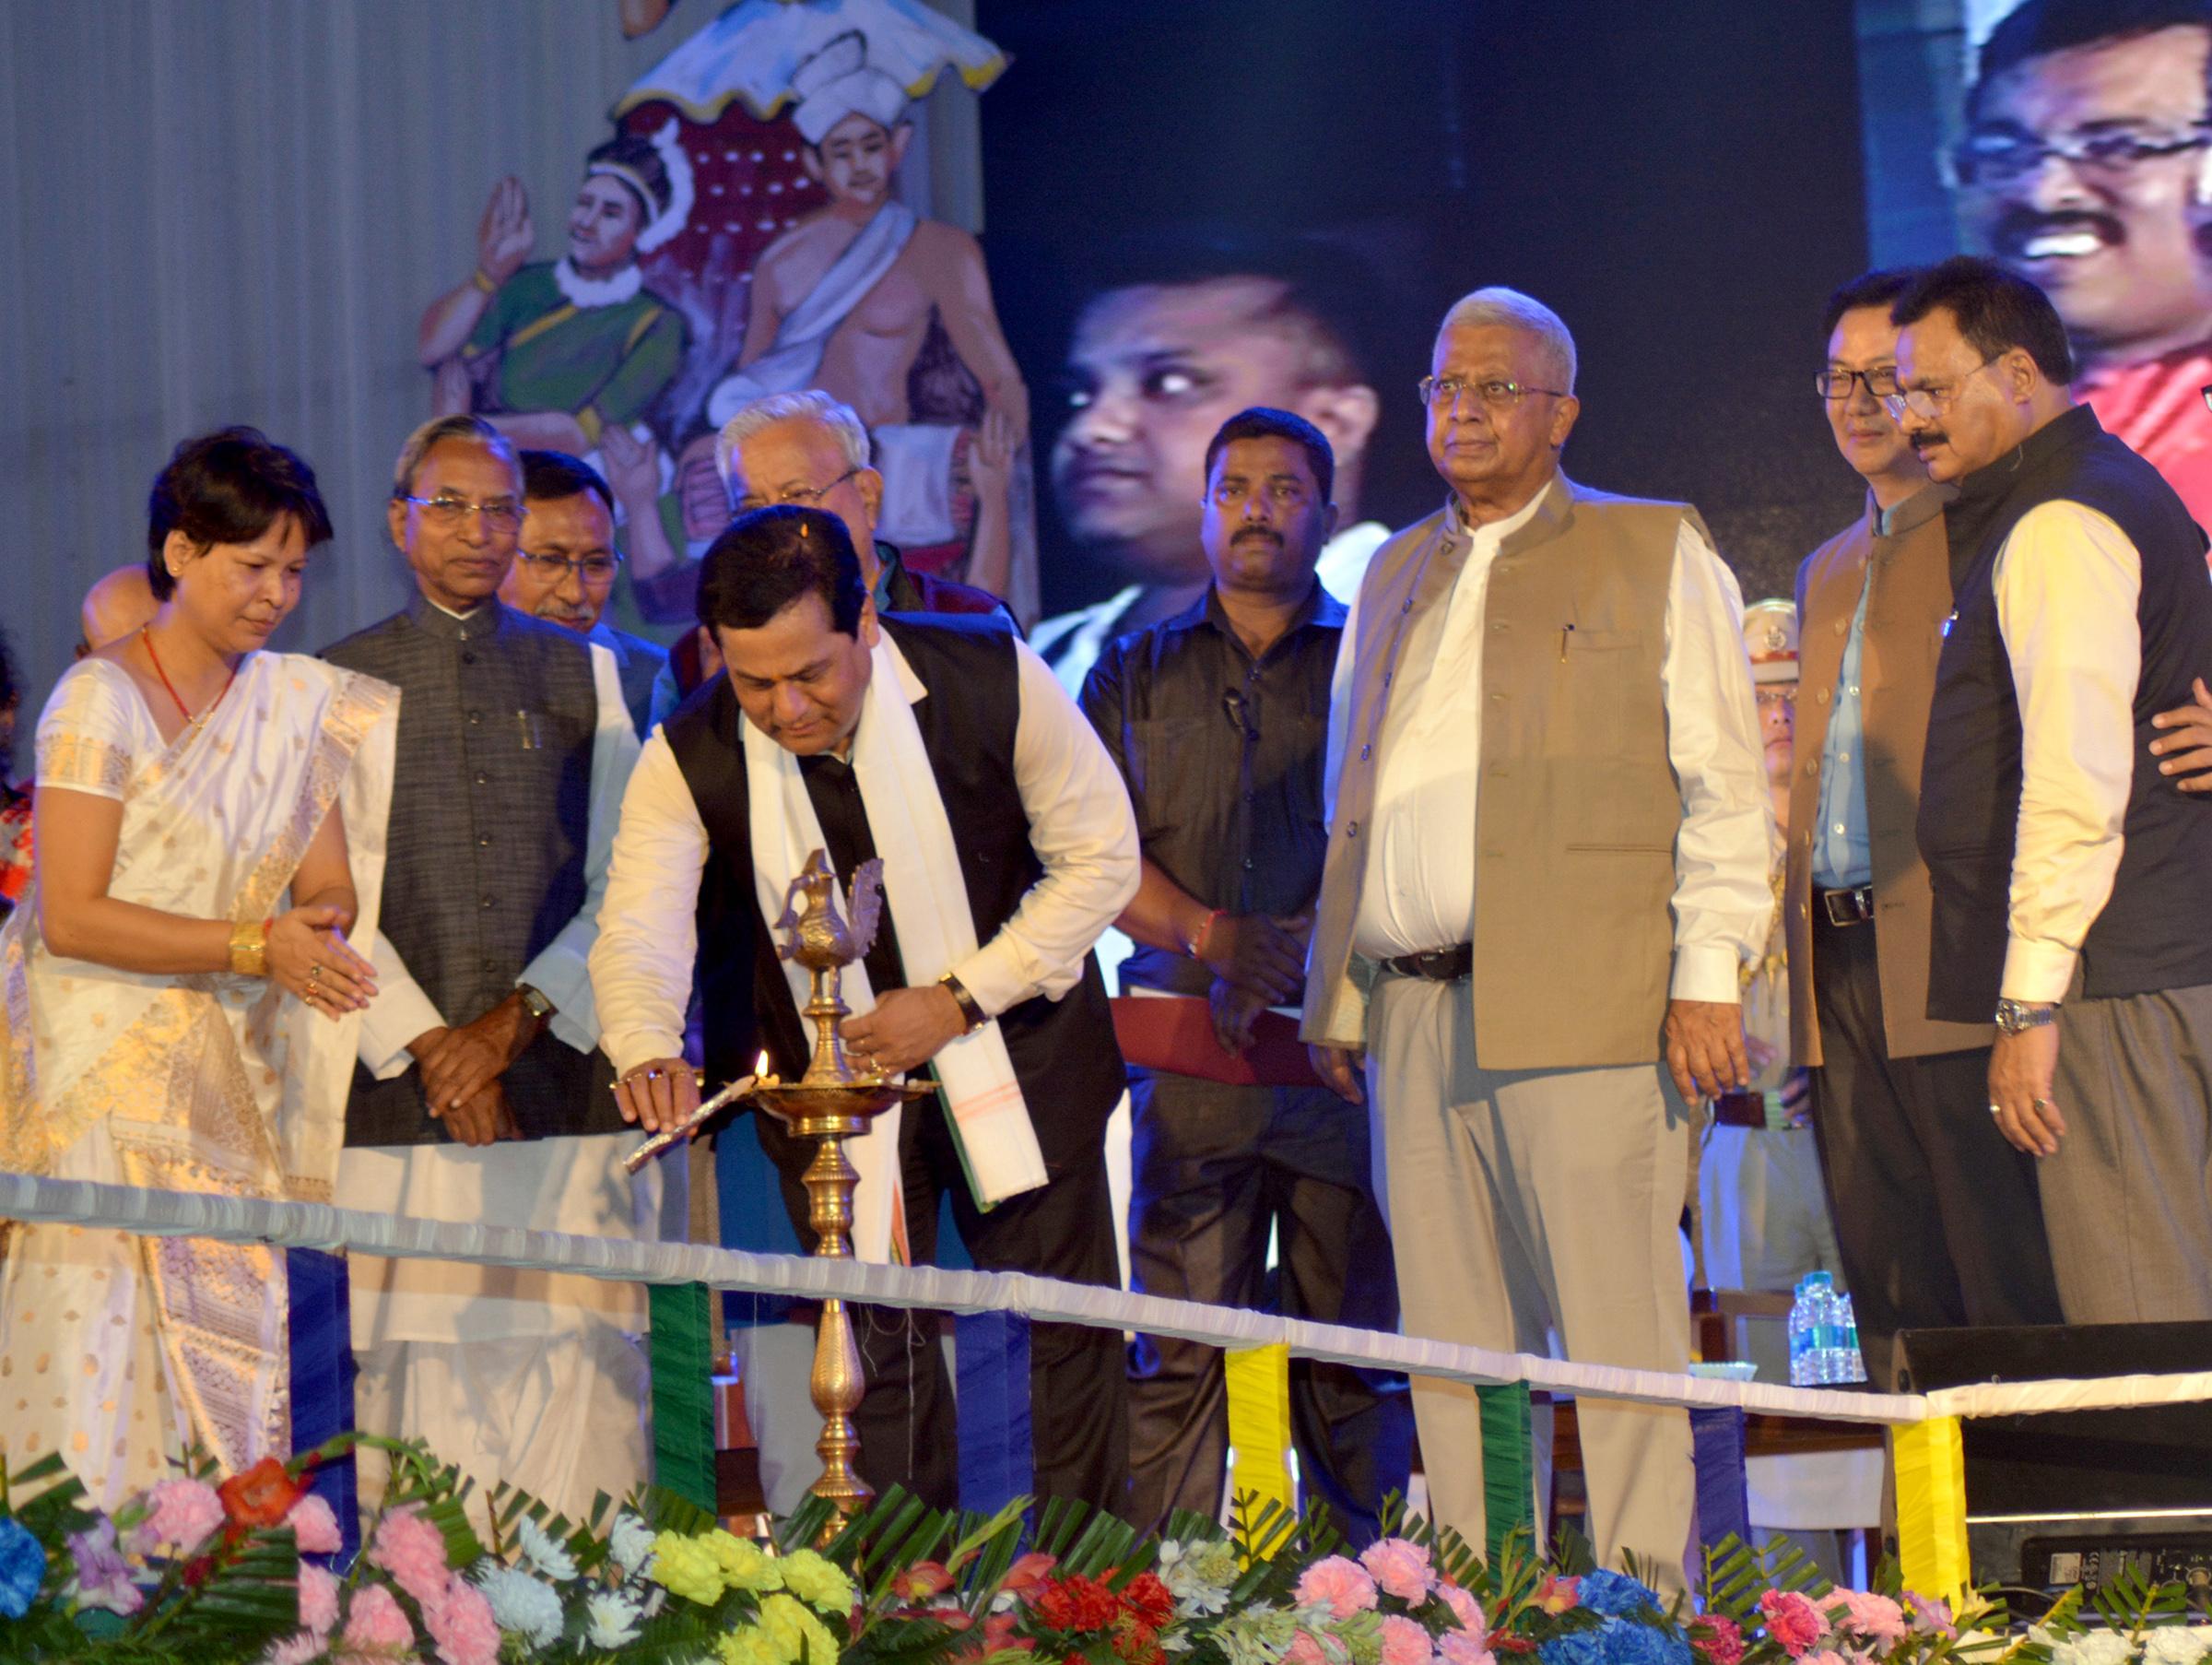 Chief Minister Sarbananda Sonowal along with others dignitaries lighting the inaugural lamp at Silchar on Saturday.